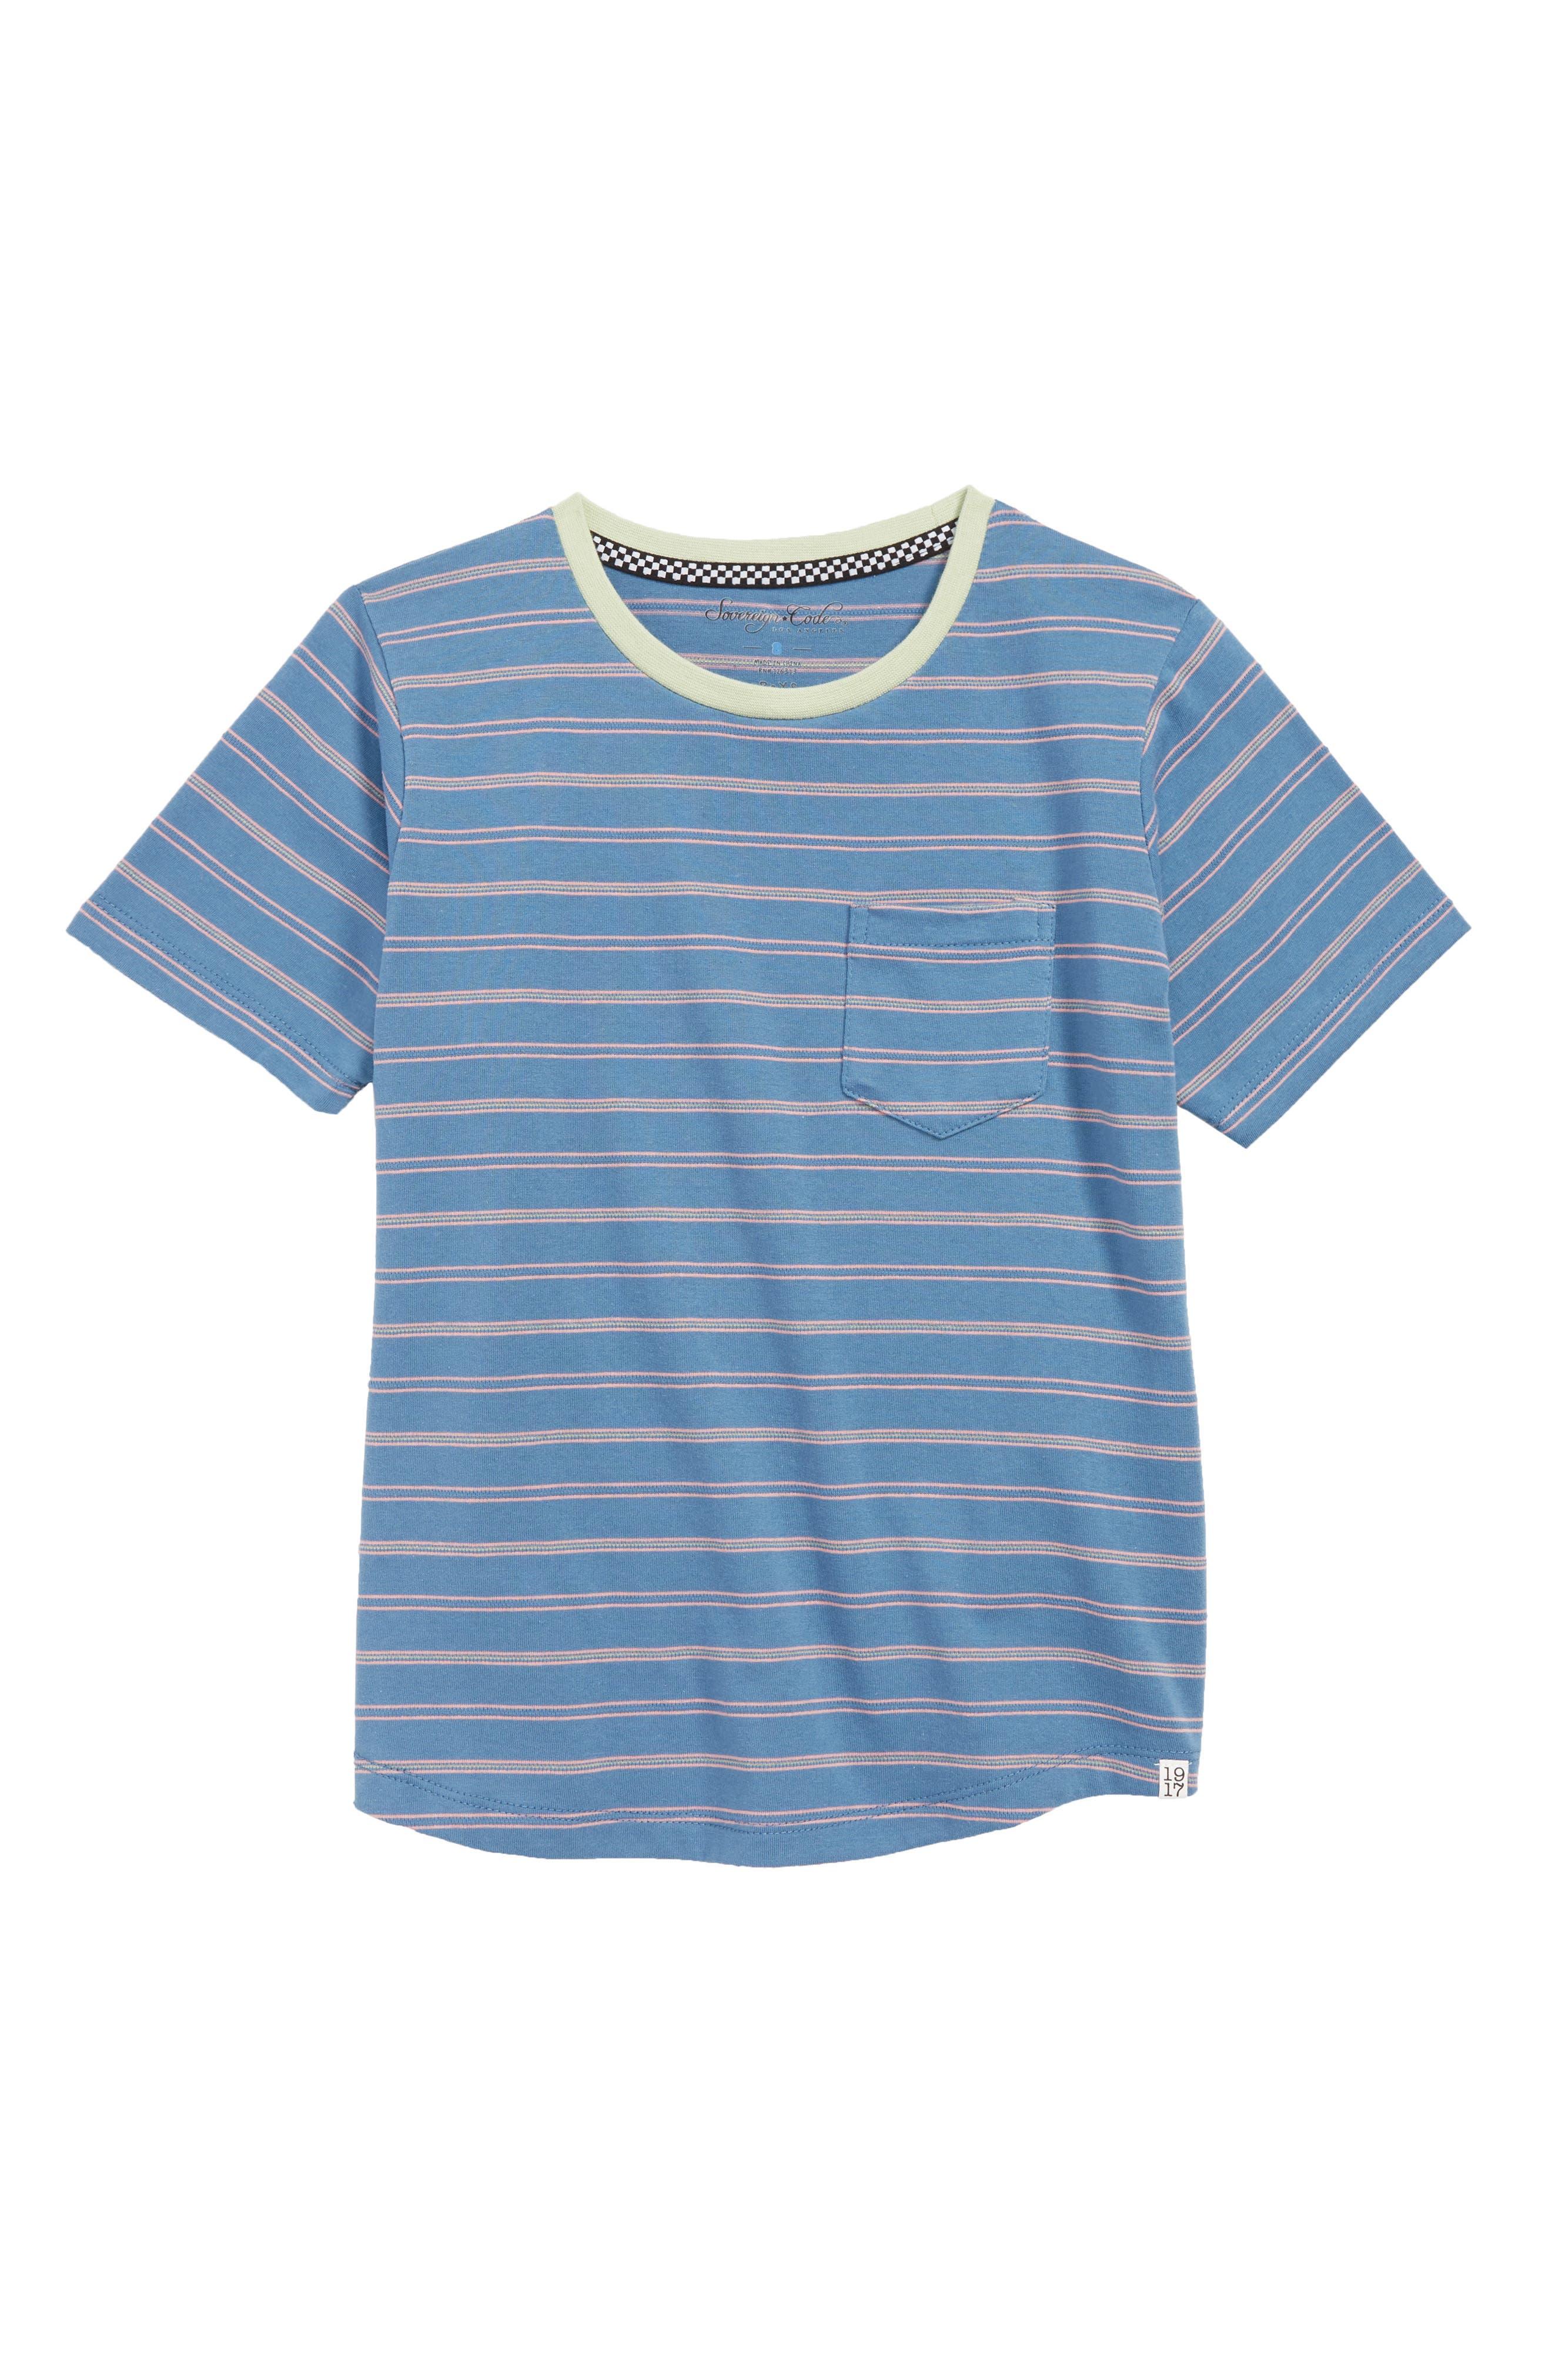 SOVEREIGN CODE Forward Stripe T-Shirt, Main, color, BLUE